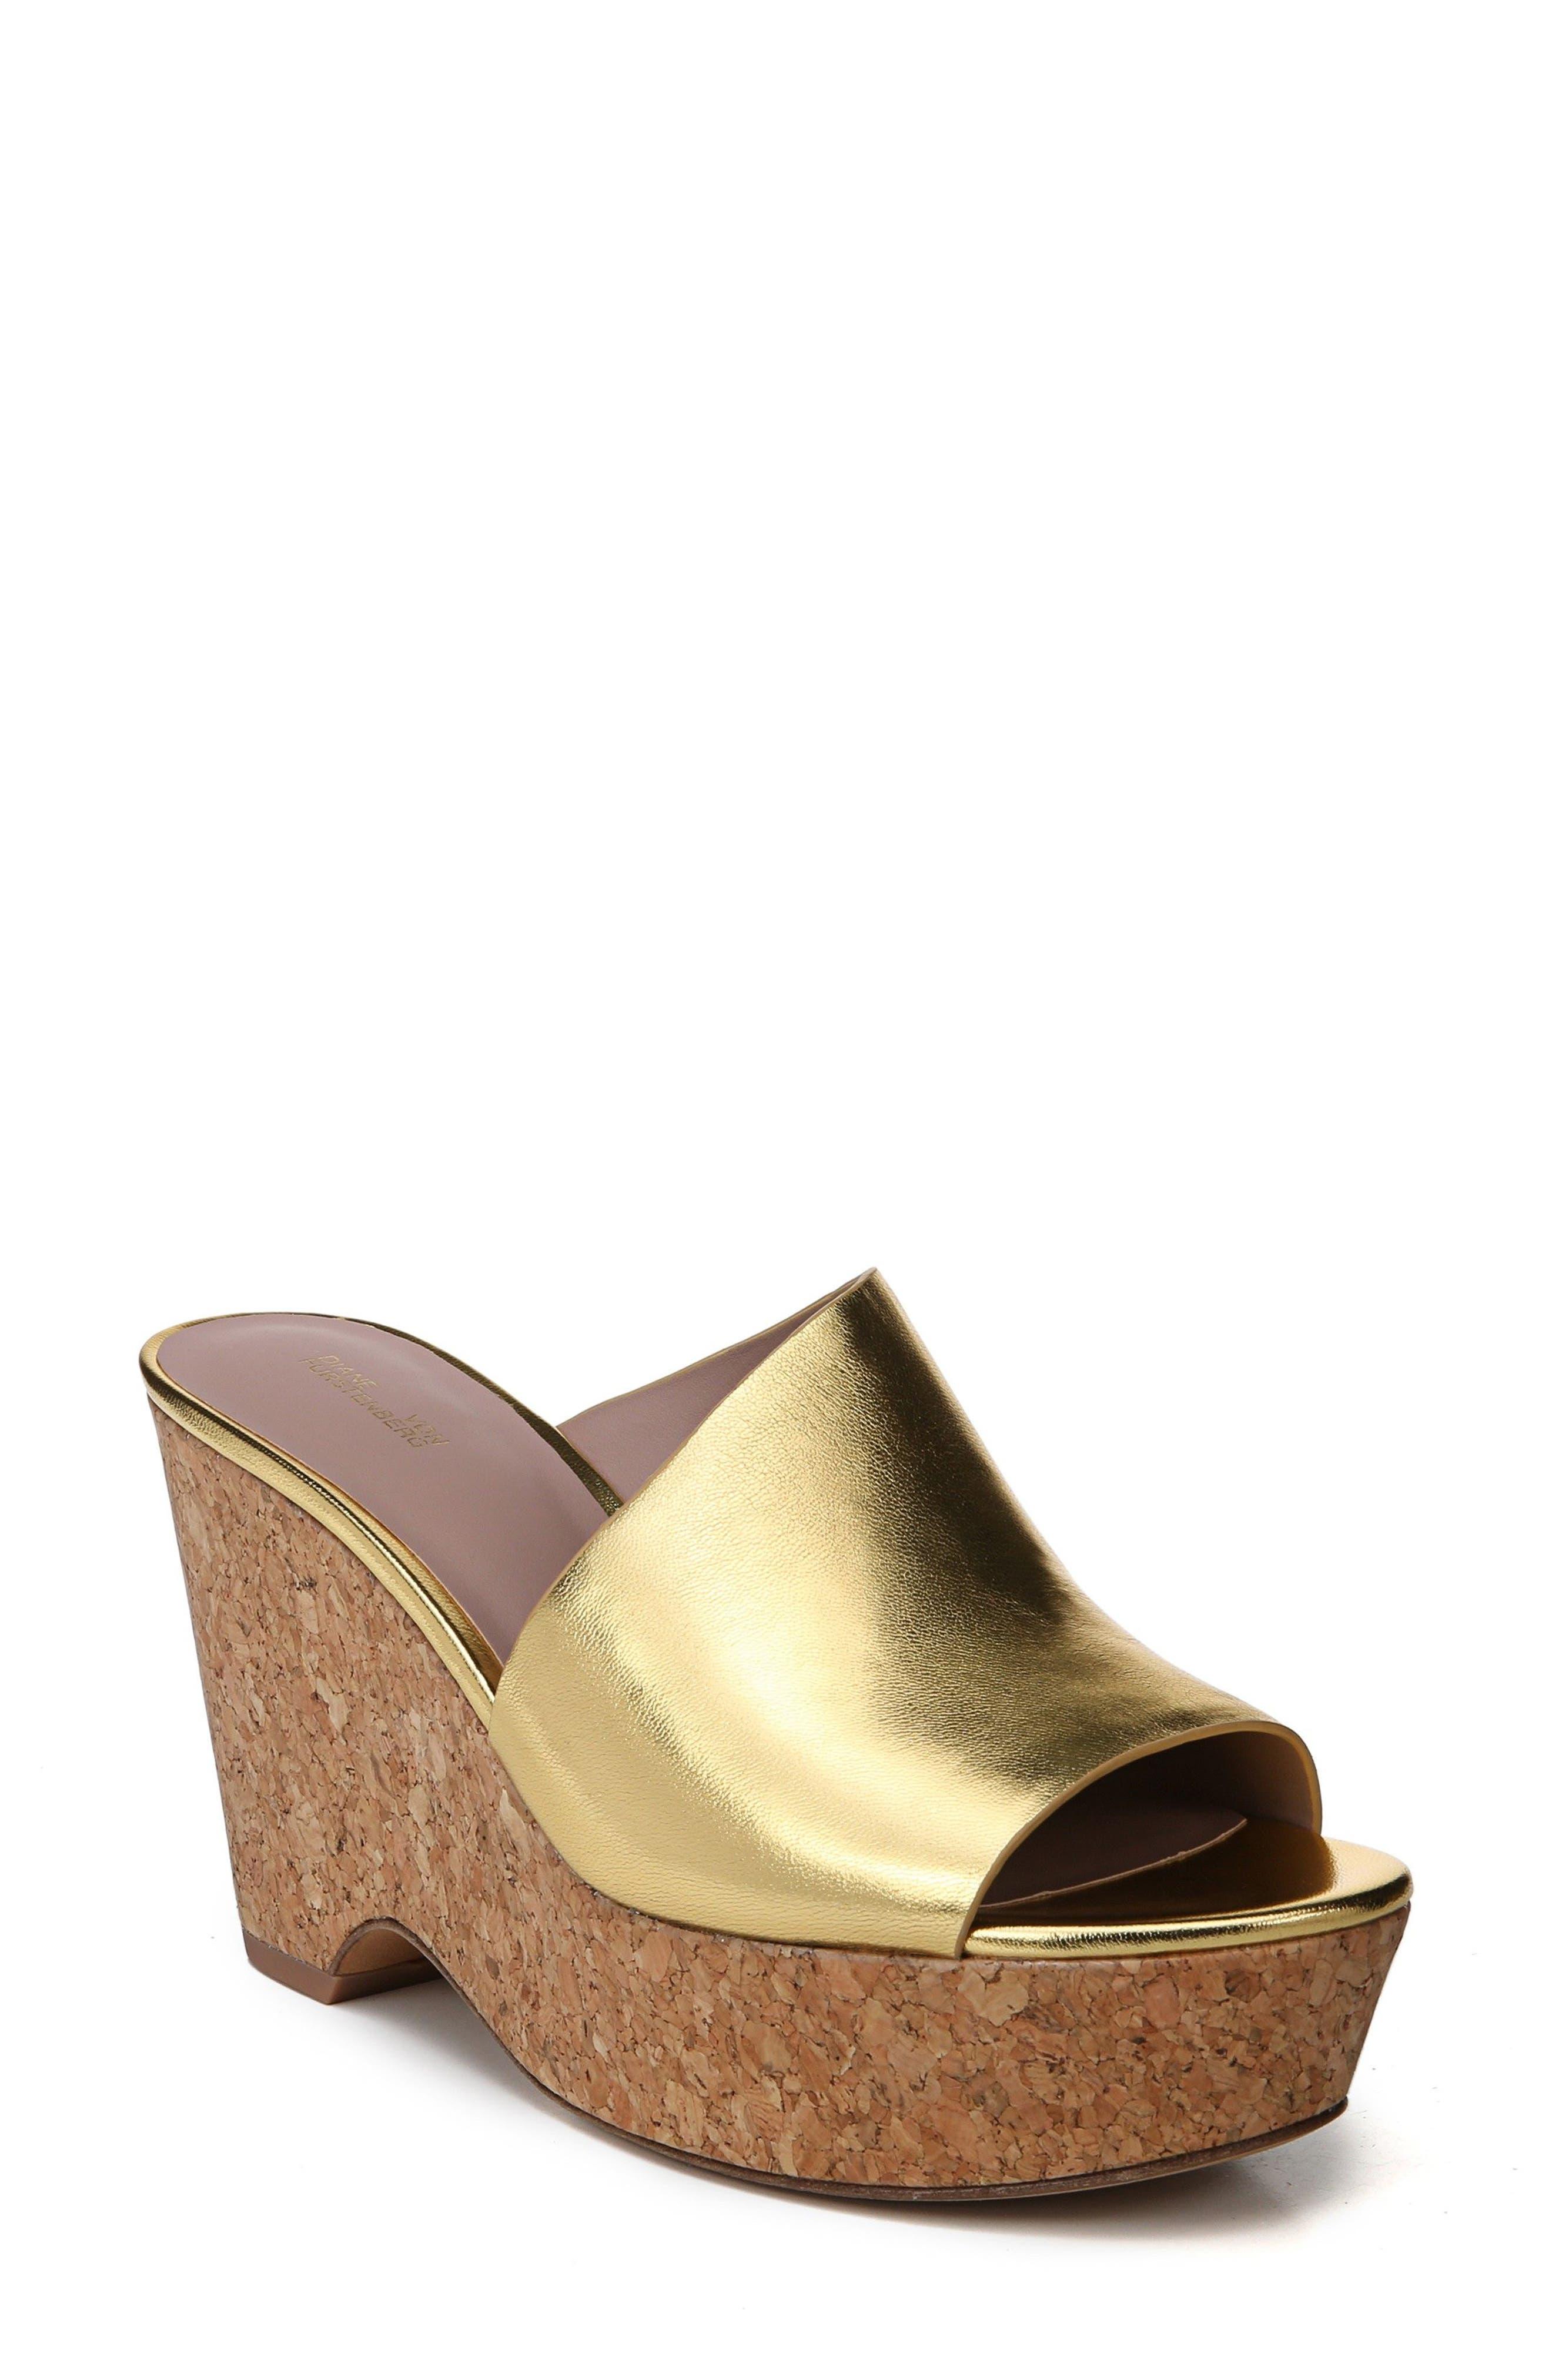 Bonnie Wedge Slide Sandal,                             Main thumbnail 1, color,                             Gold